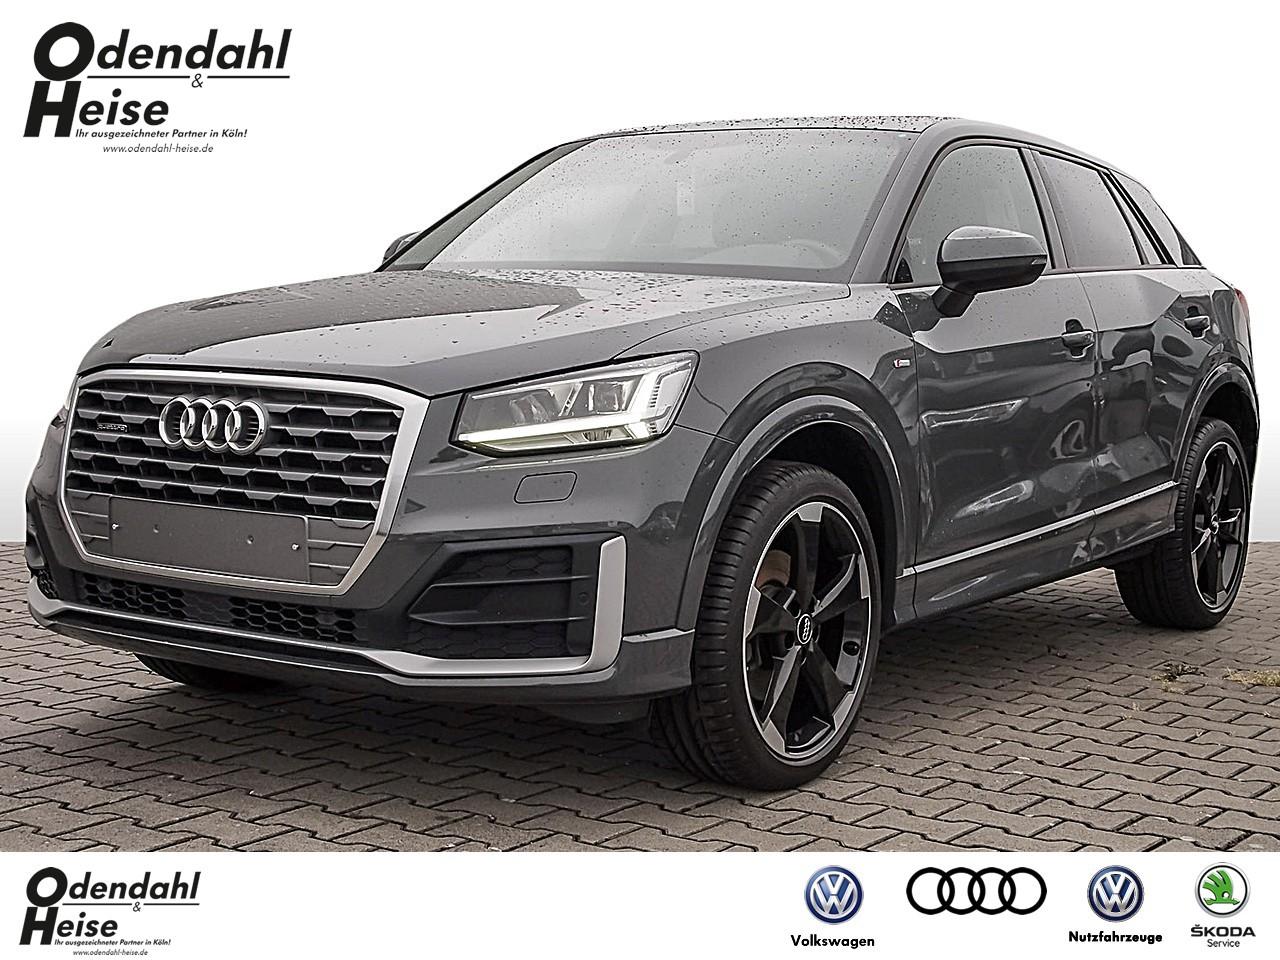 Audi Q2 design 2,0 l TDI quattro DSG Klima Navi, Jahr 2016, Diesel